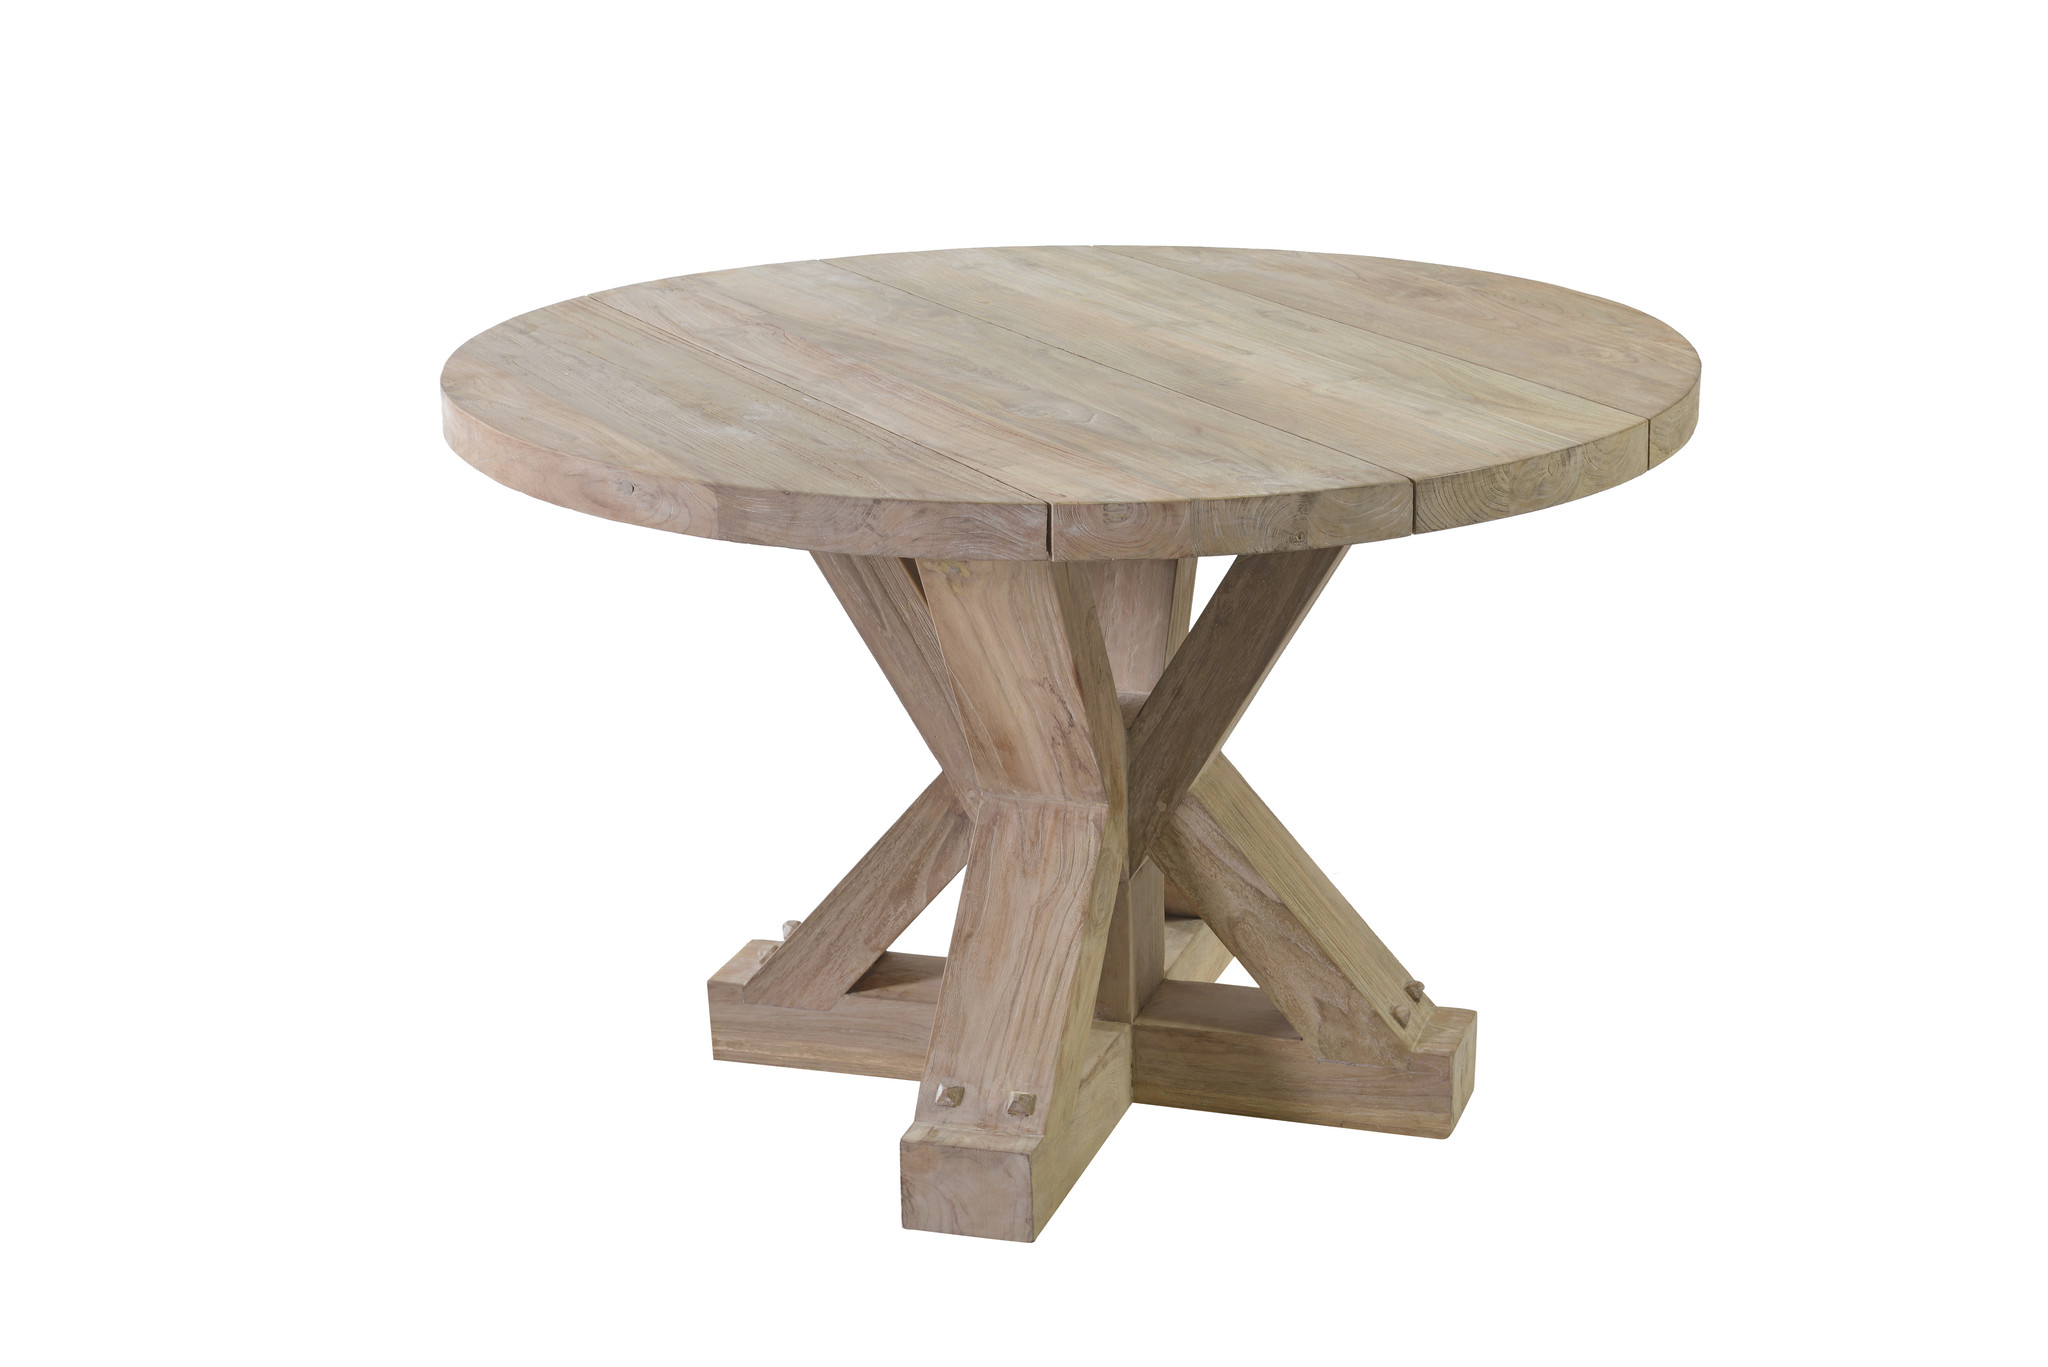 Max & Luuk Jim Table 120 - Teak